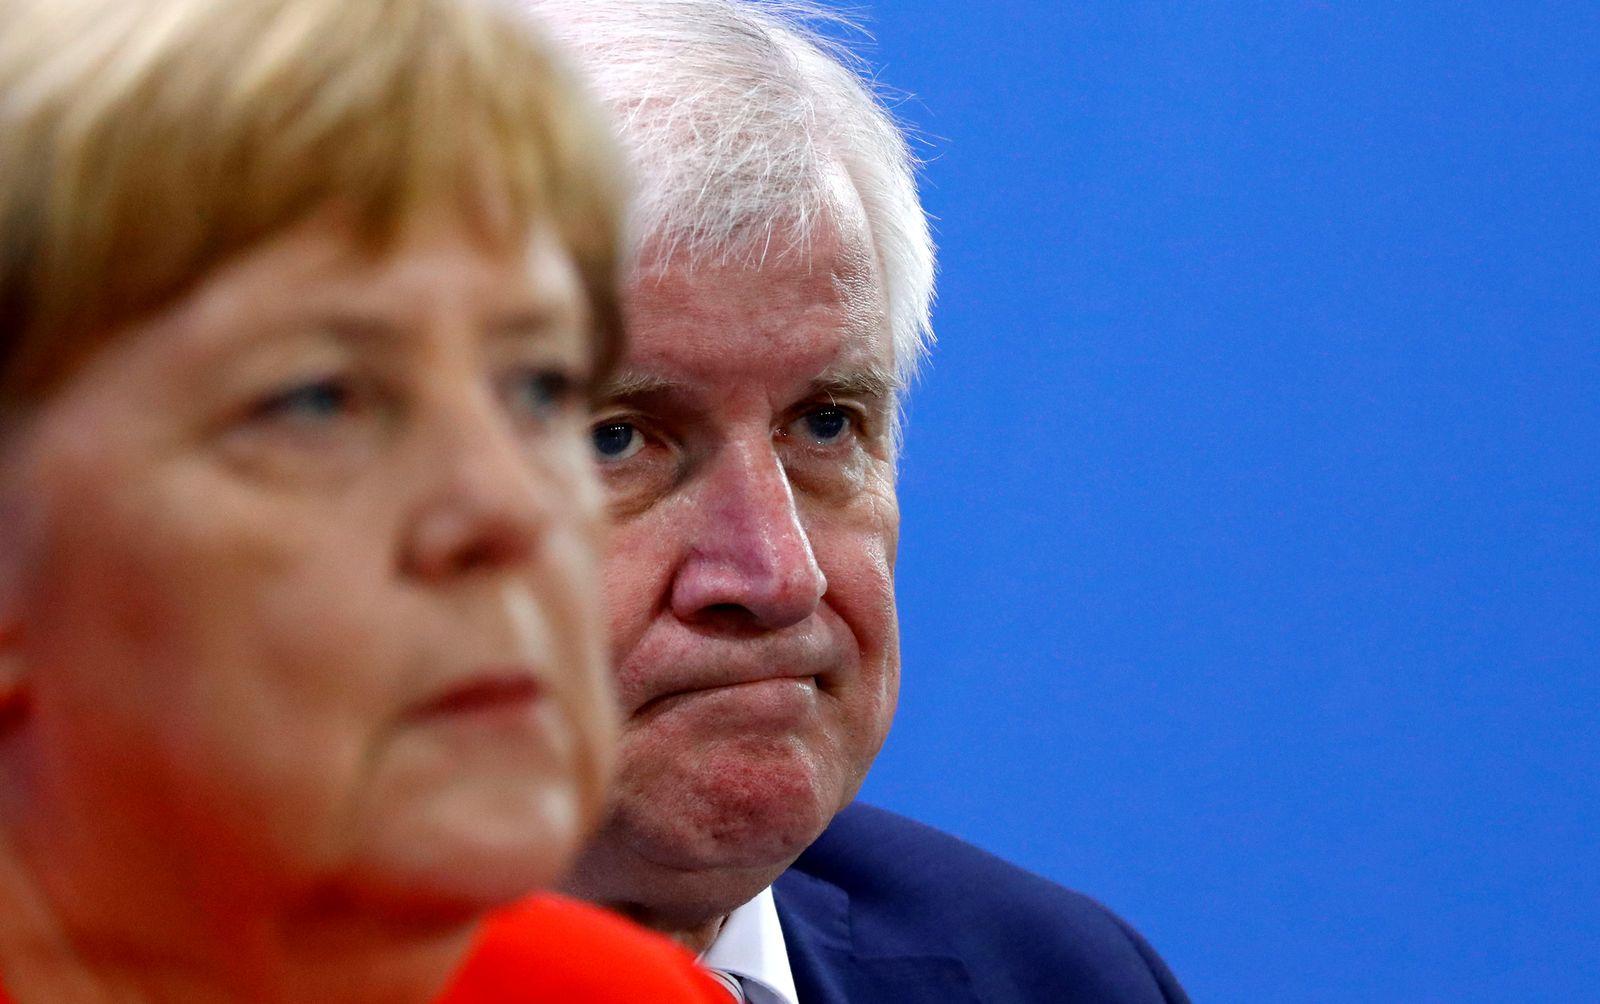 GERMANY-POLITICS/MERKEL